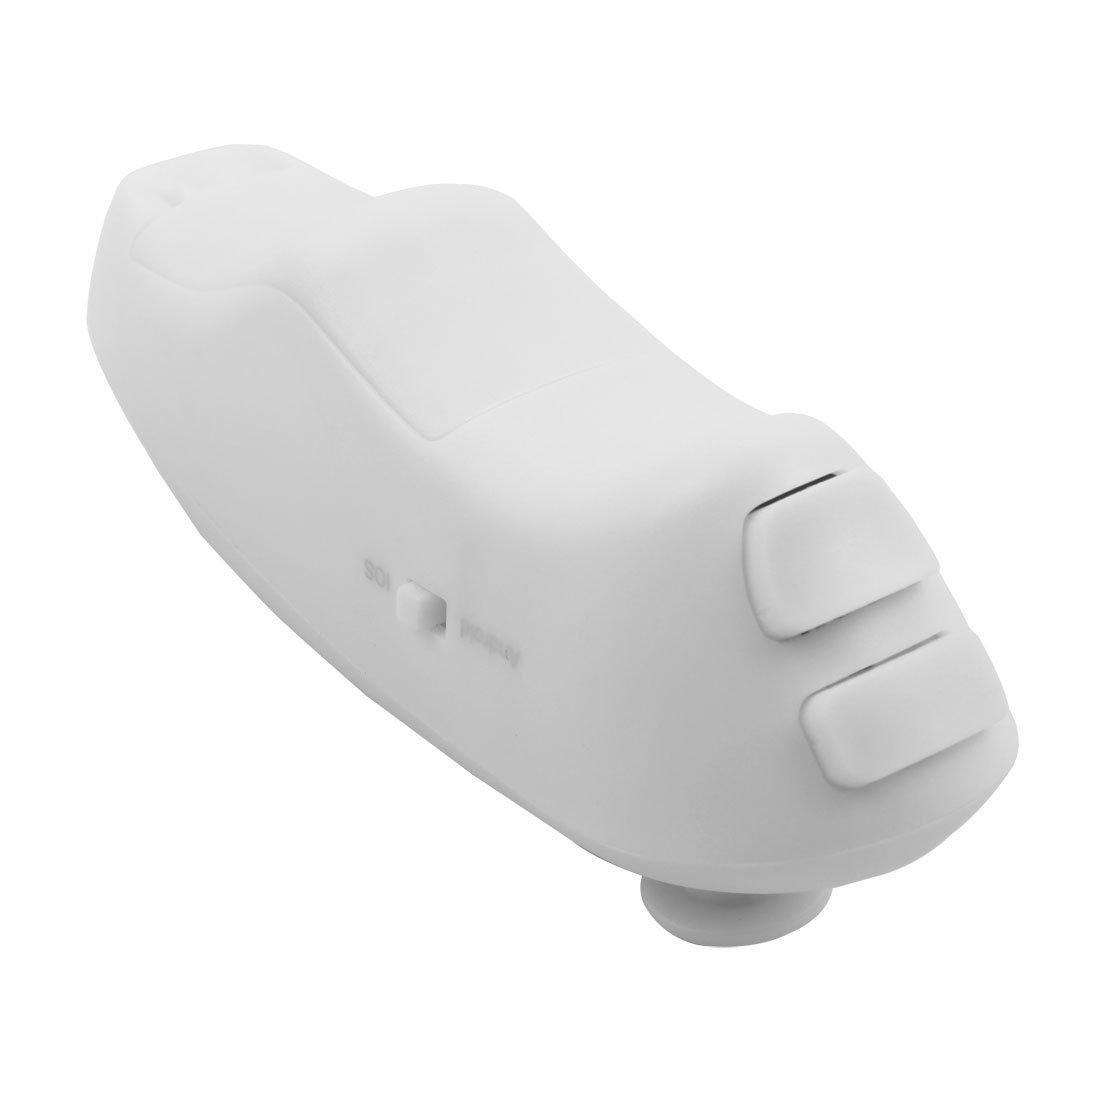 Amazon.com: eDealMax Control remoto Universal VR cabeza de caja inalámbrica Bluetooth Mini Juego de Mango Blanco: Electronics